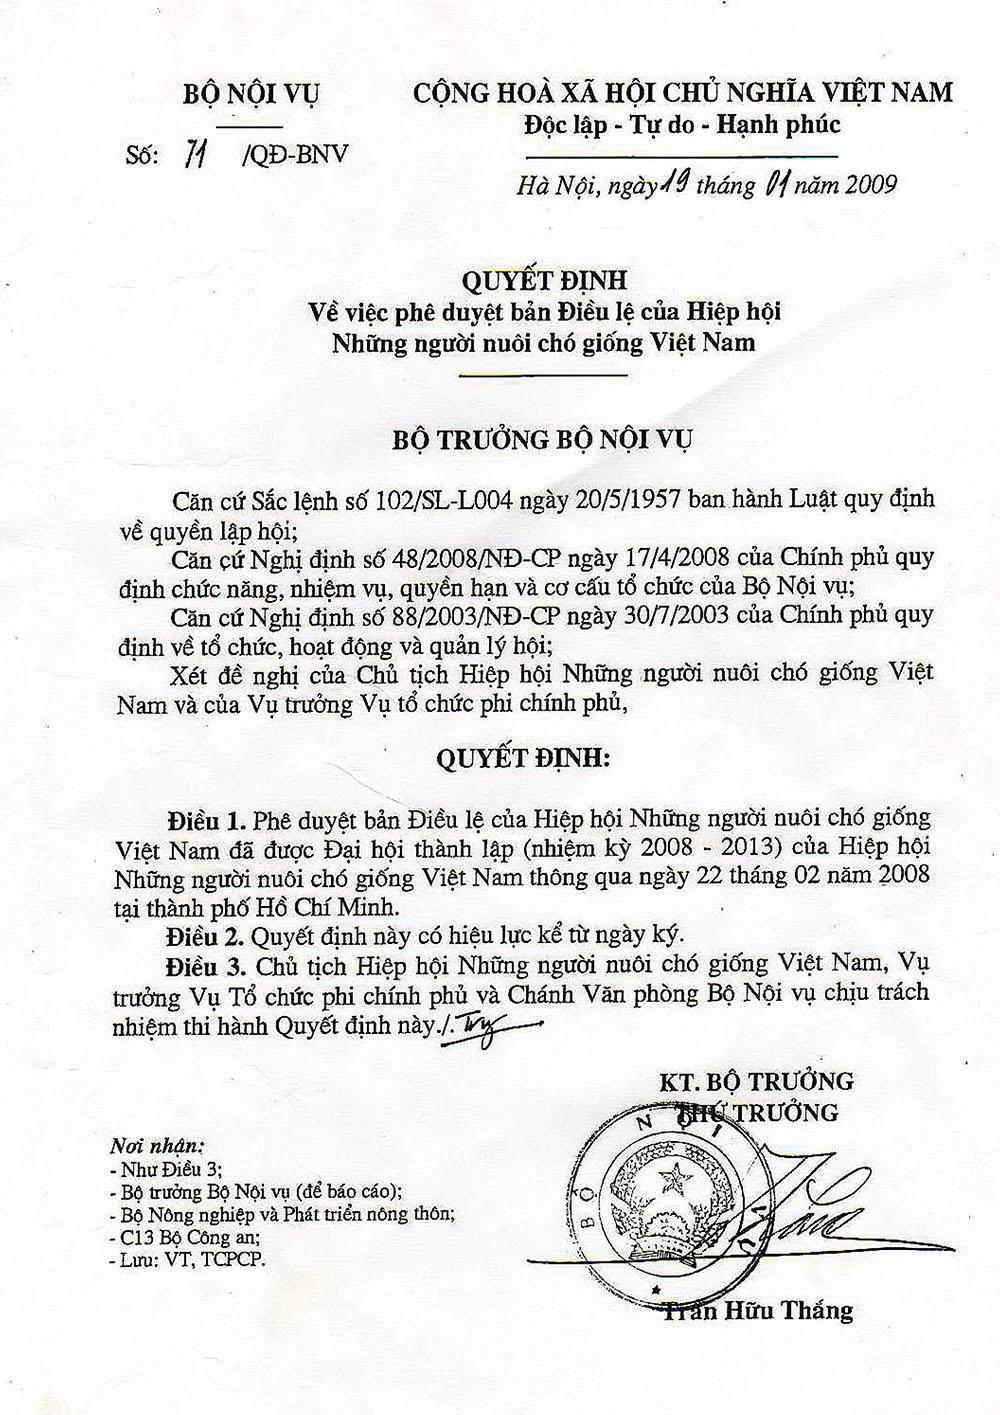 QD BNV - VKA.jpg